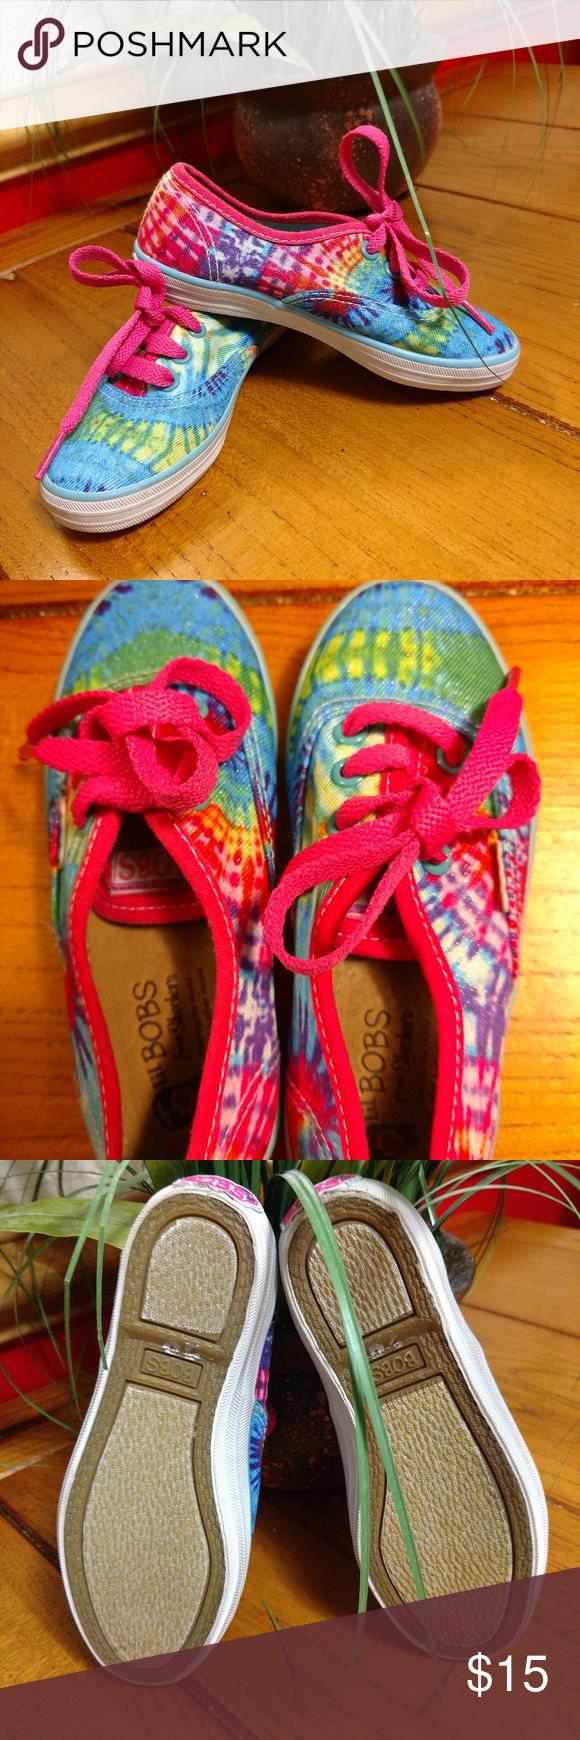 Little girl shoes, Girls tennis shoes